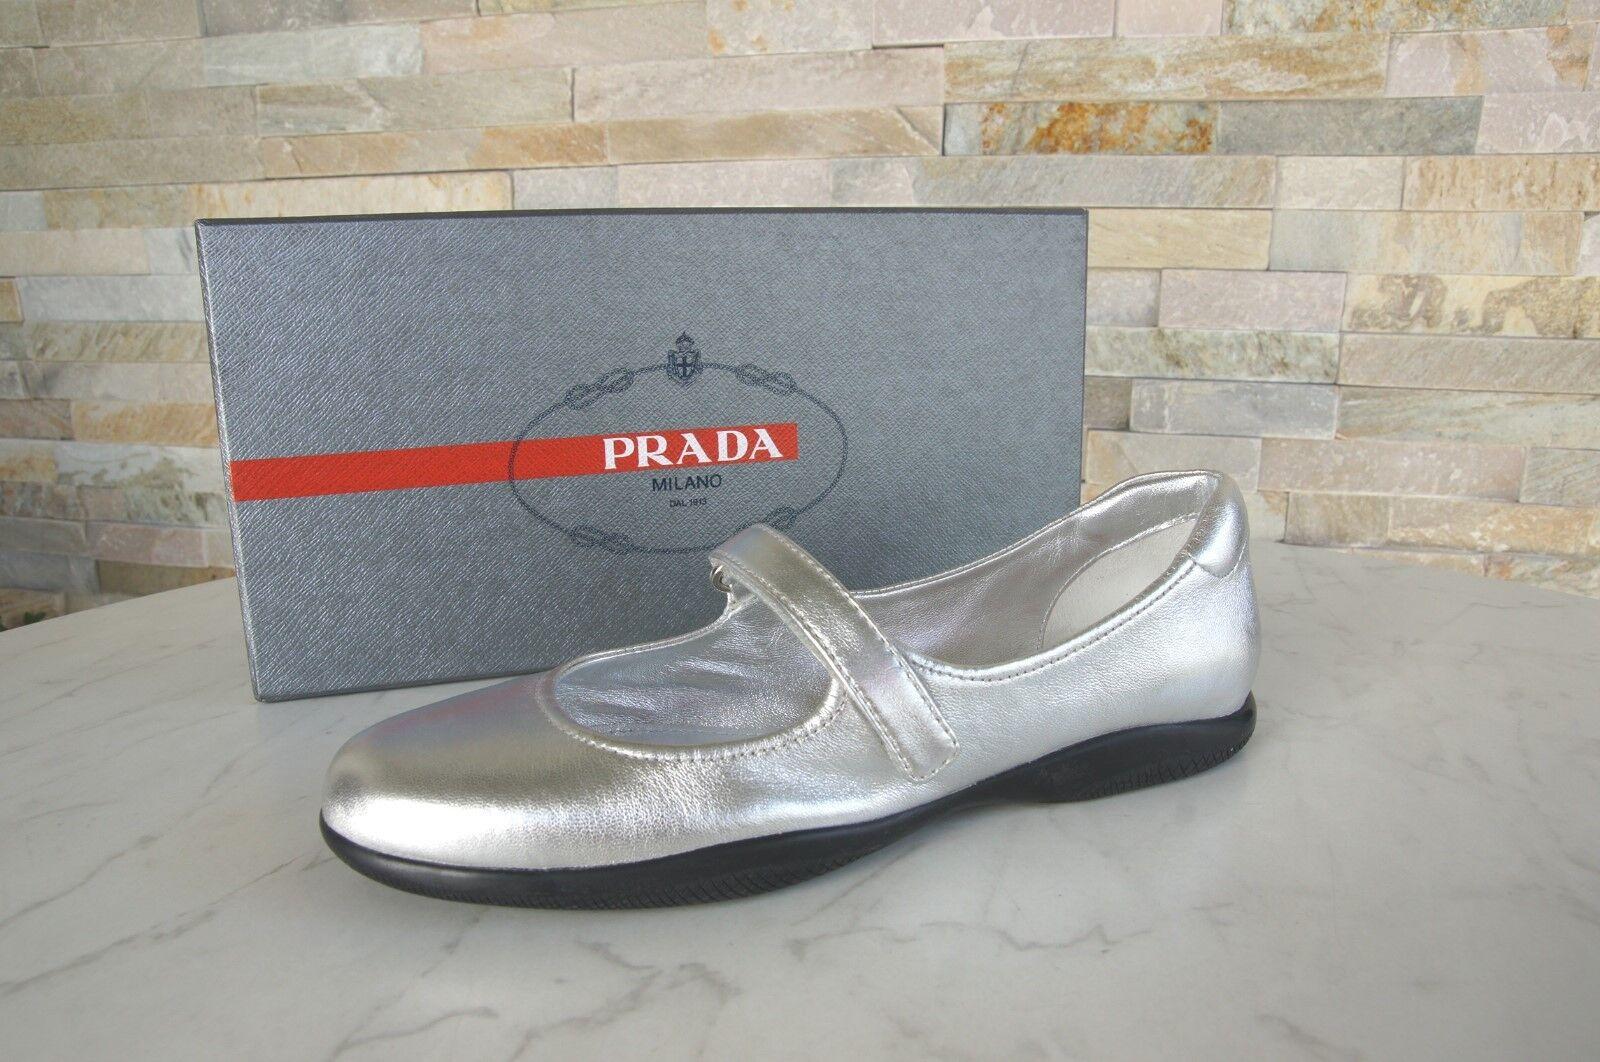 PRADA PRADA PRADA Gr 38,5 Ballerinas Slipper 3F5733 Schuhe Halbschuhe nero NEU 69bb33